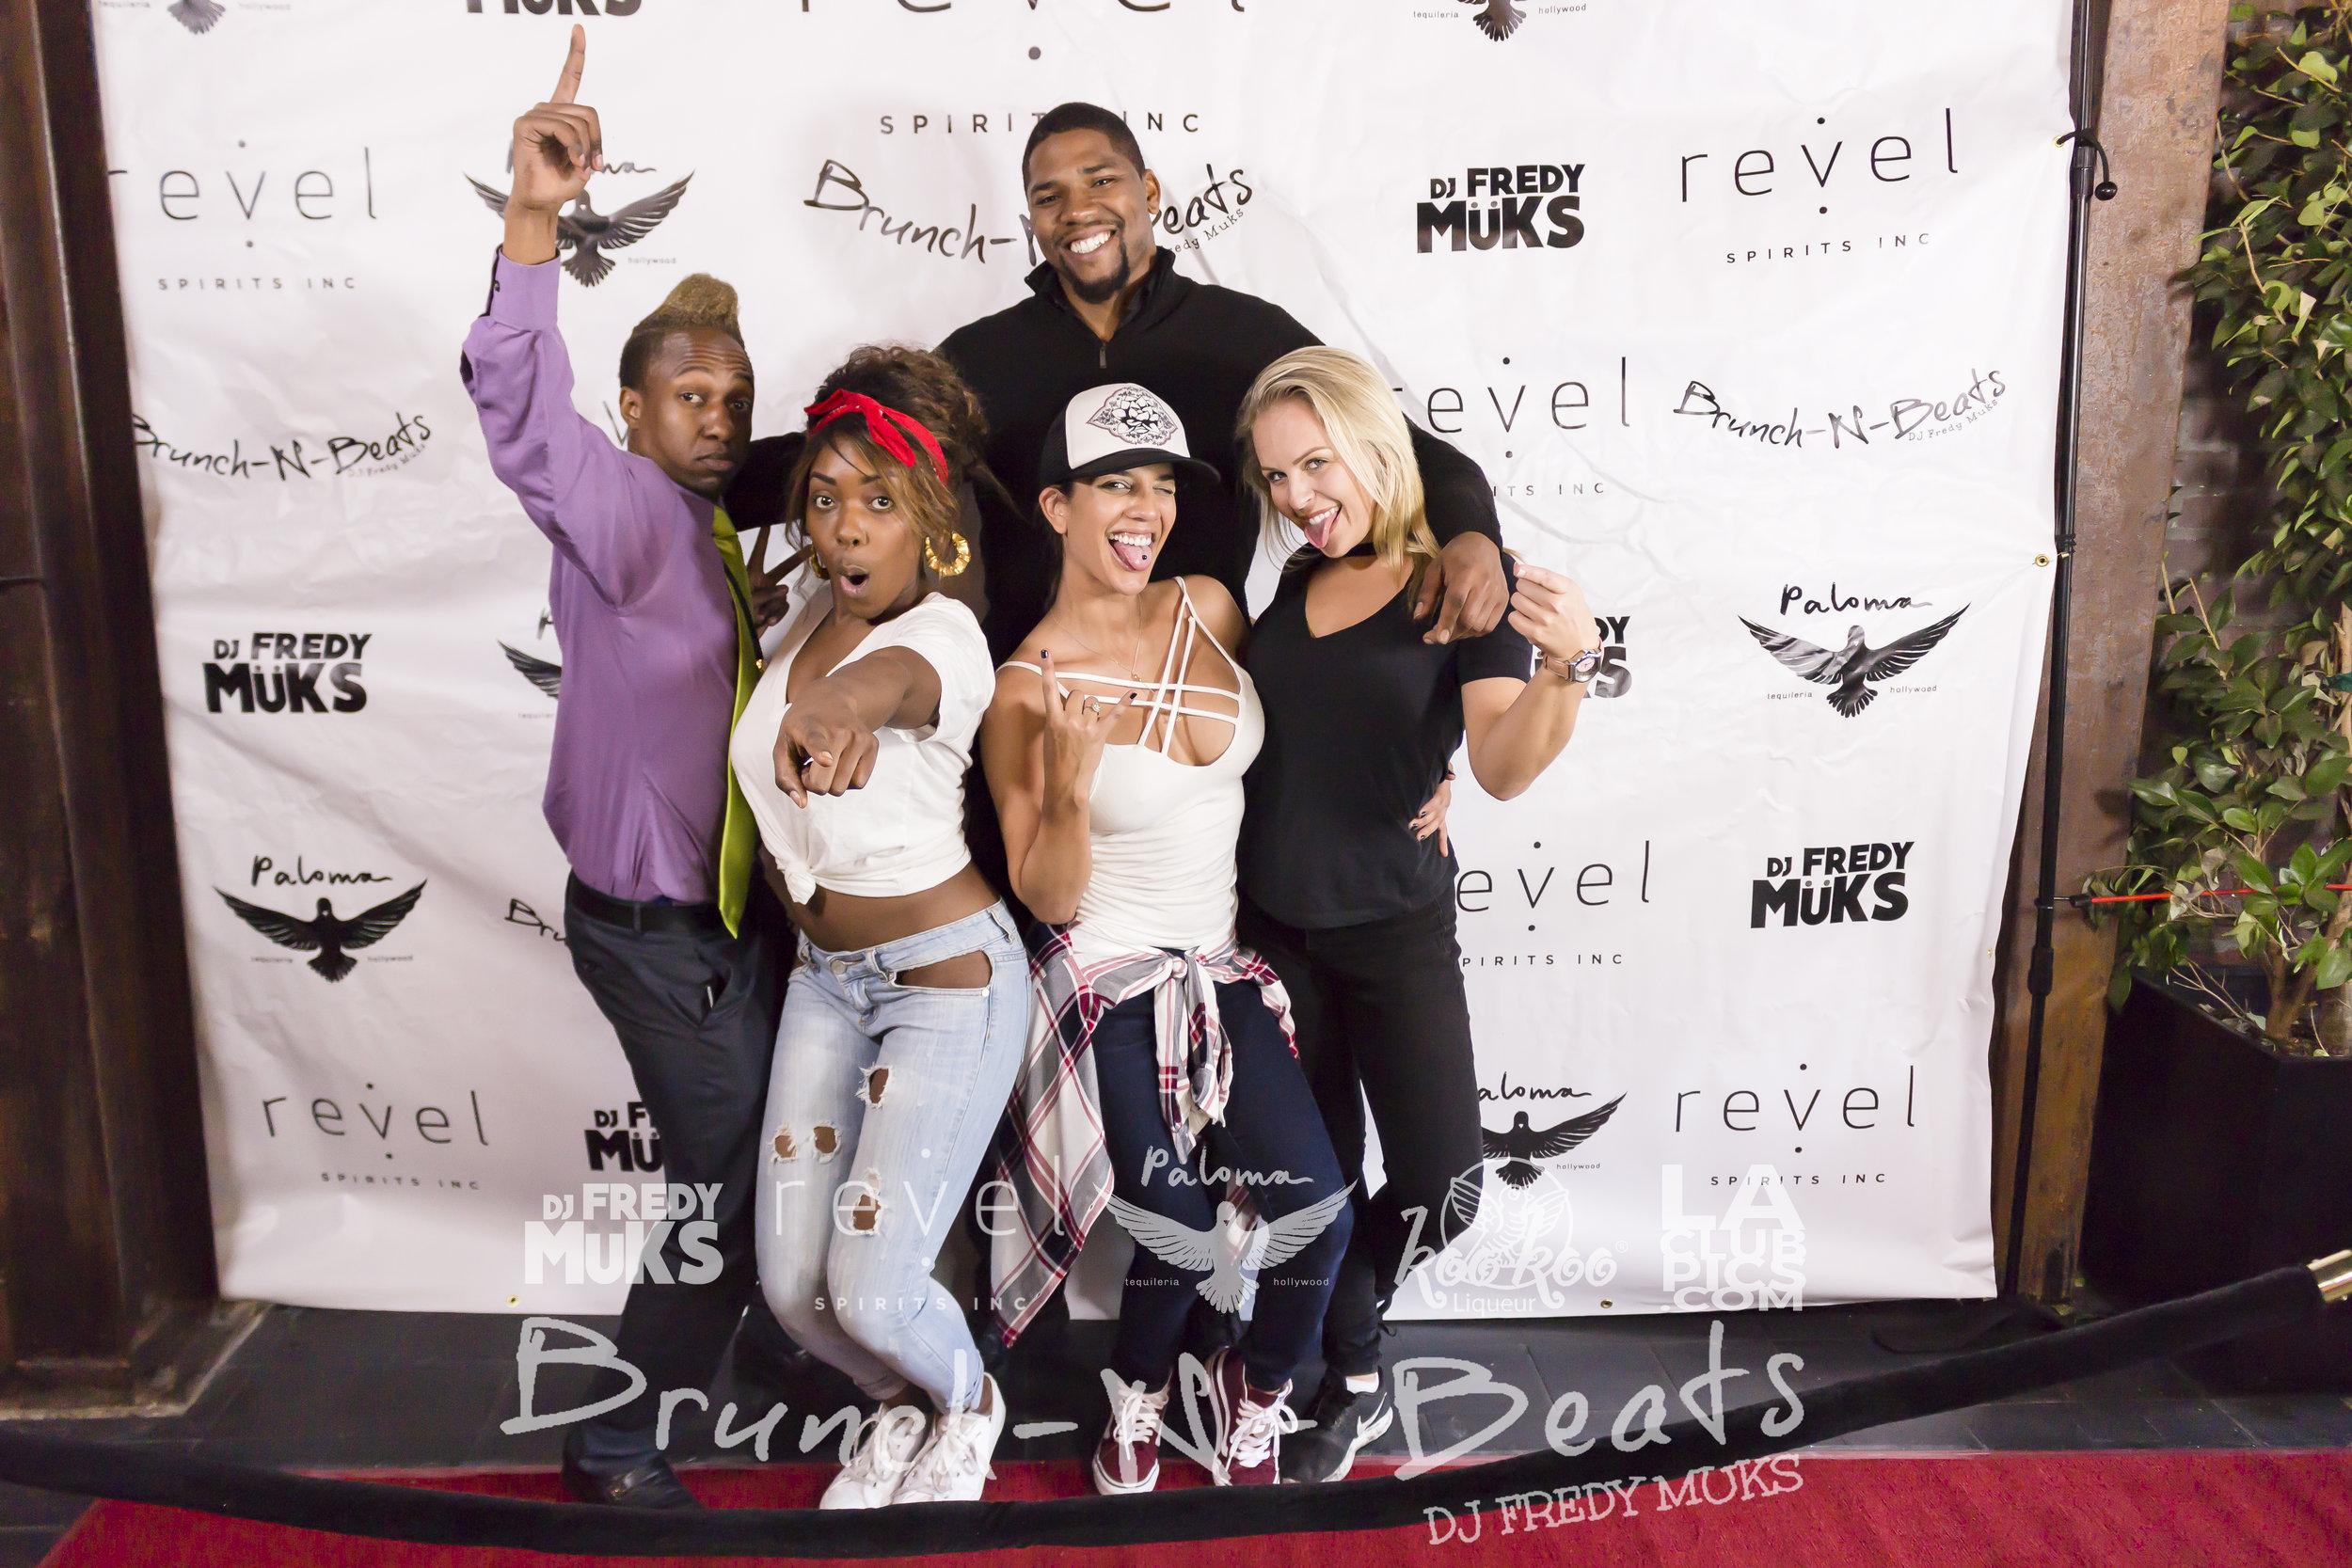 Brunch-N-Beats - 03-11-18_107.jpg